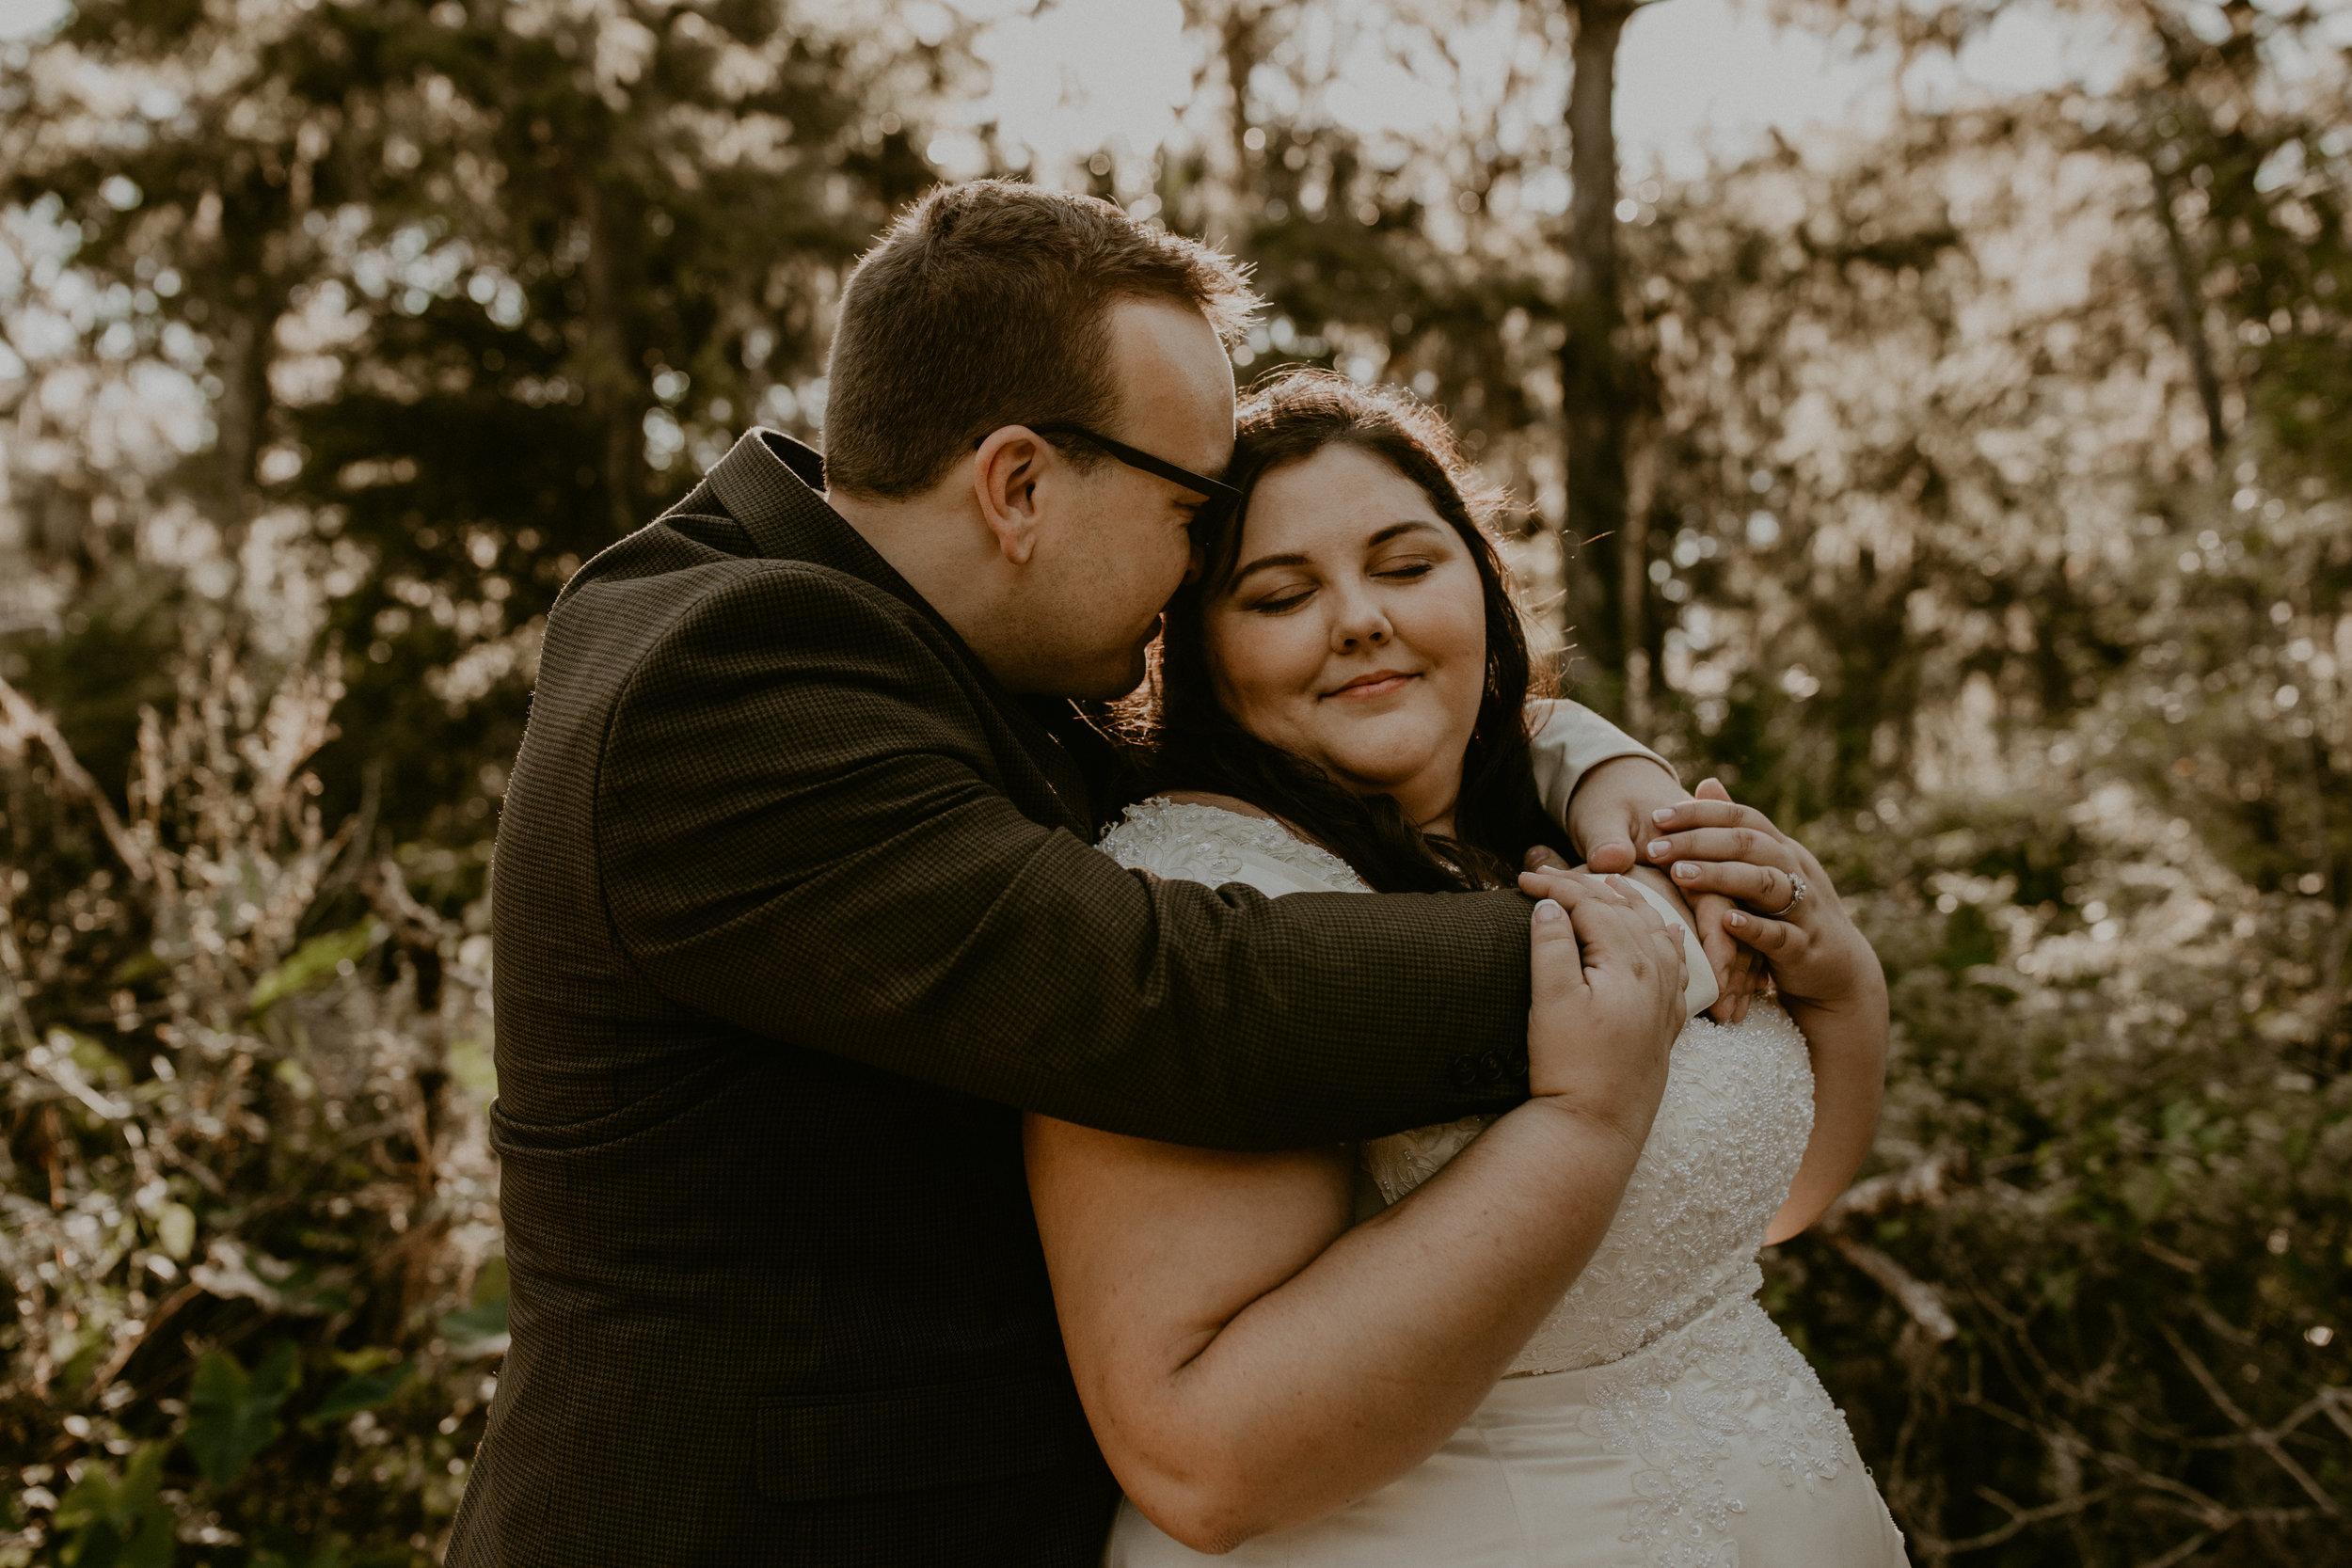 Silver Springs State Park Silver Springs Florida-Wedding-Kat and Tom25.JPG